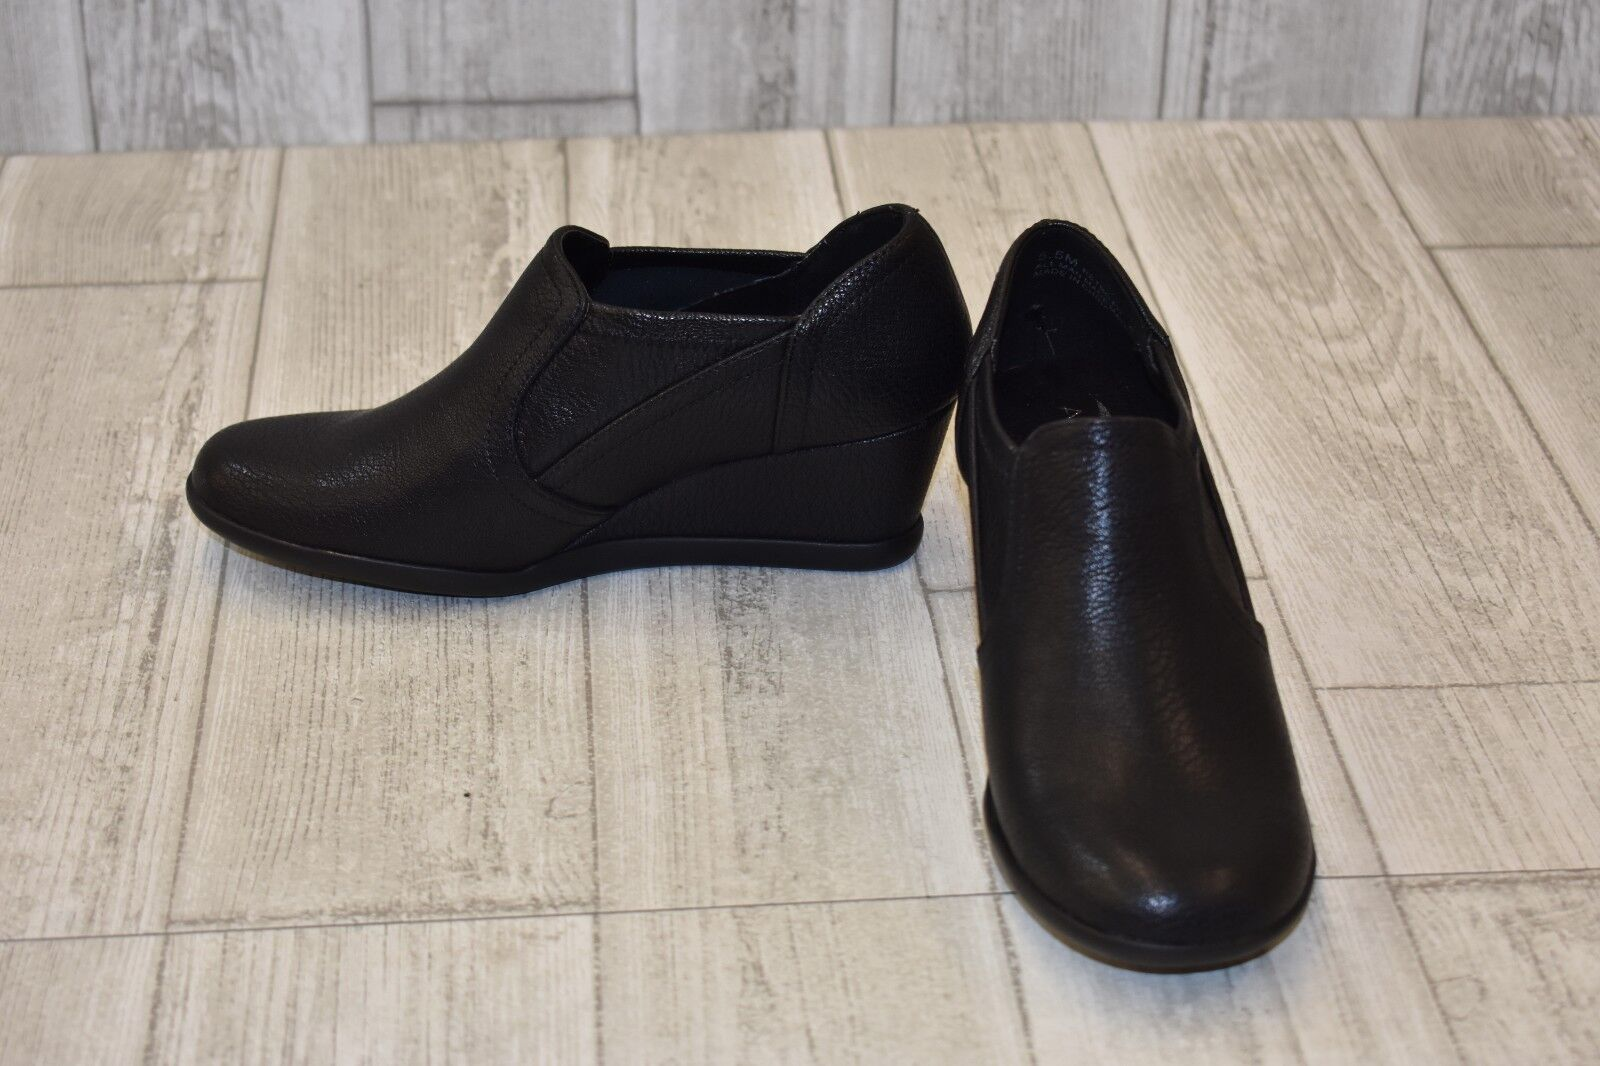 Aerosoles Retro Fit Booties - Women's Size 5.5M - Black (NEW )